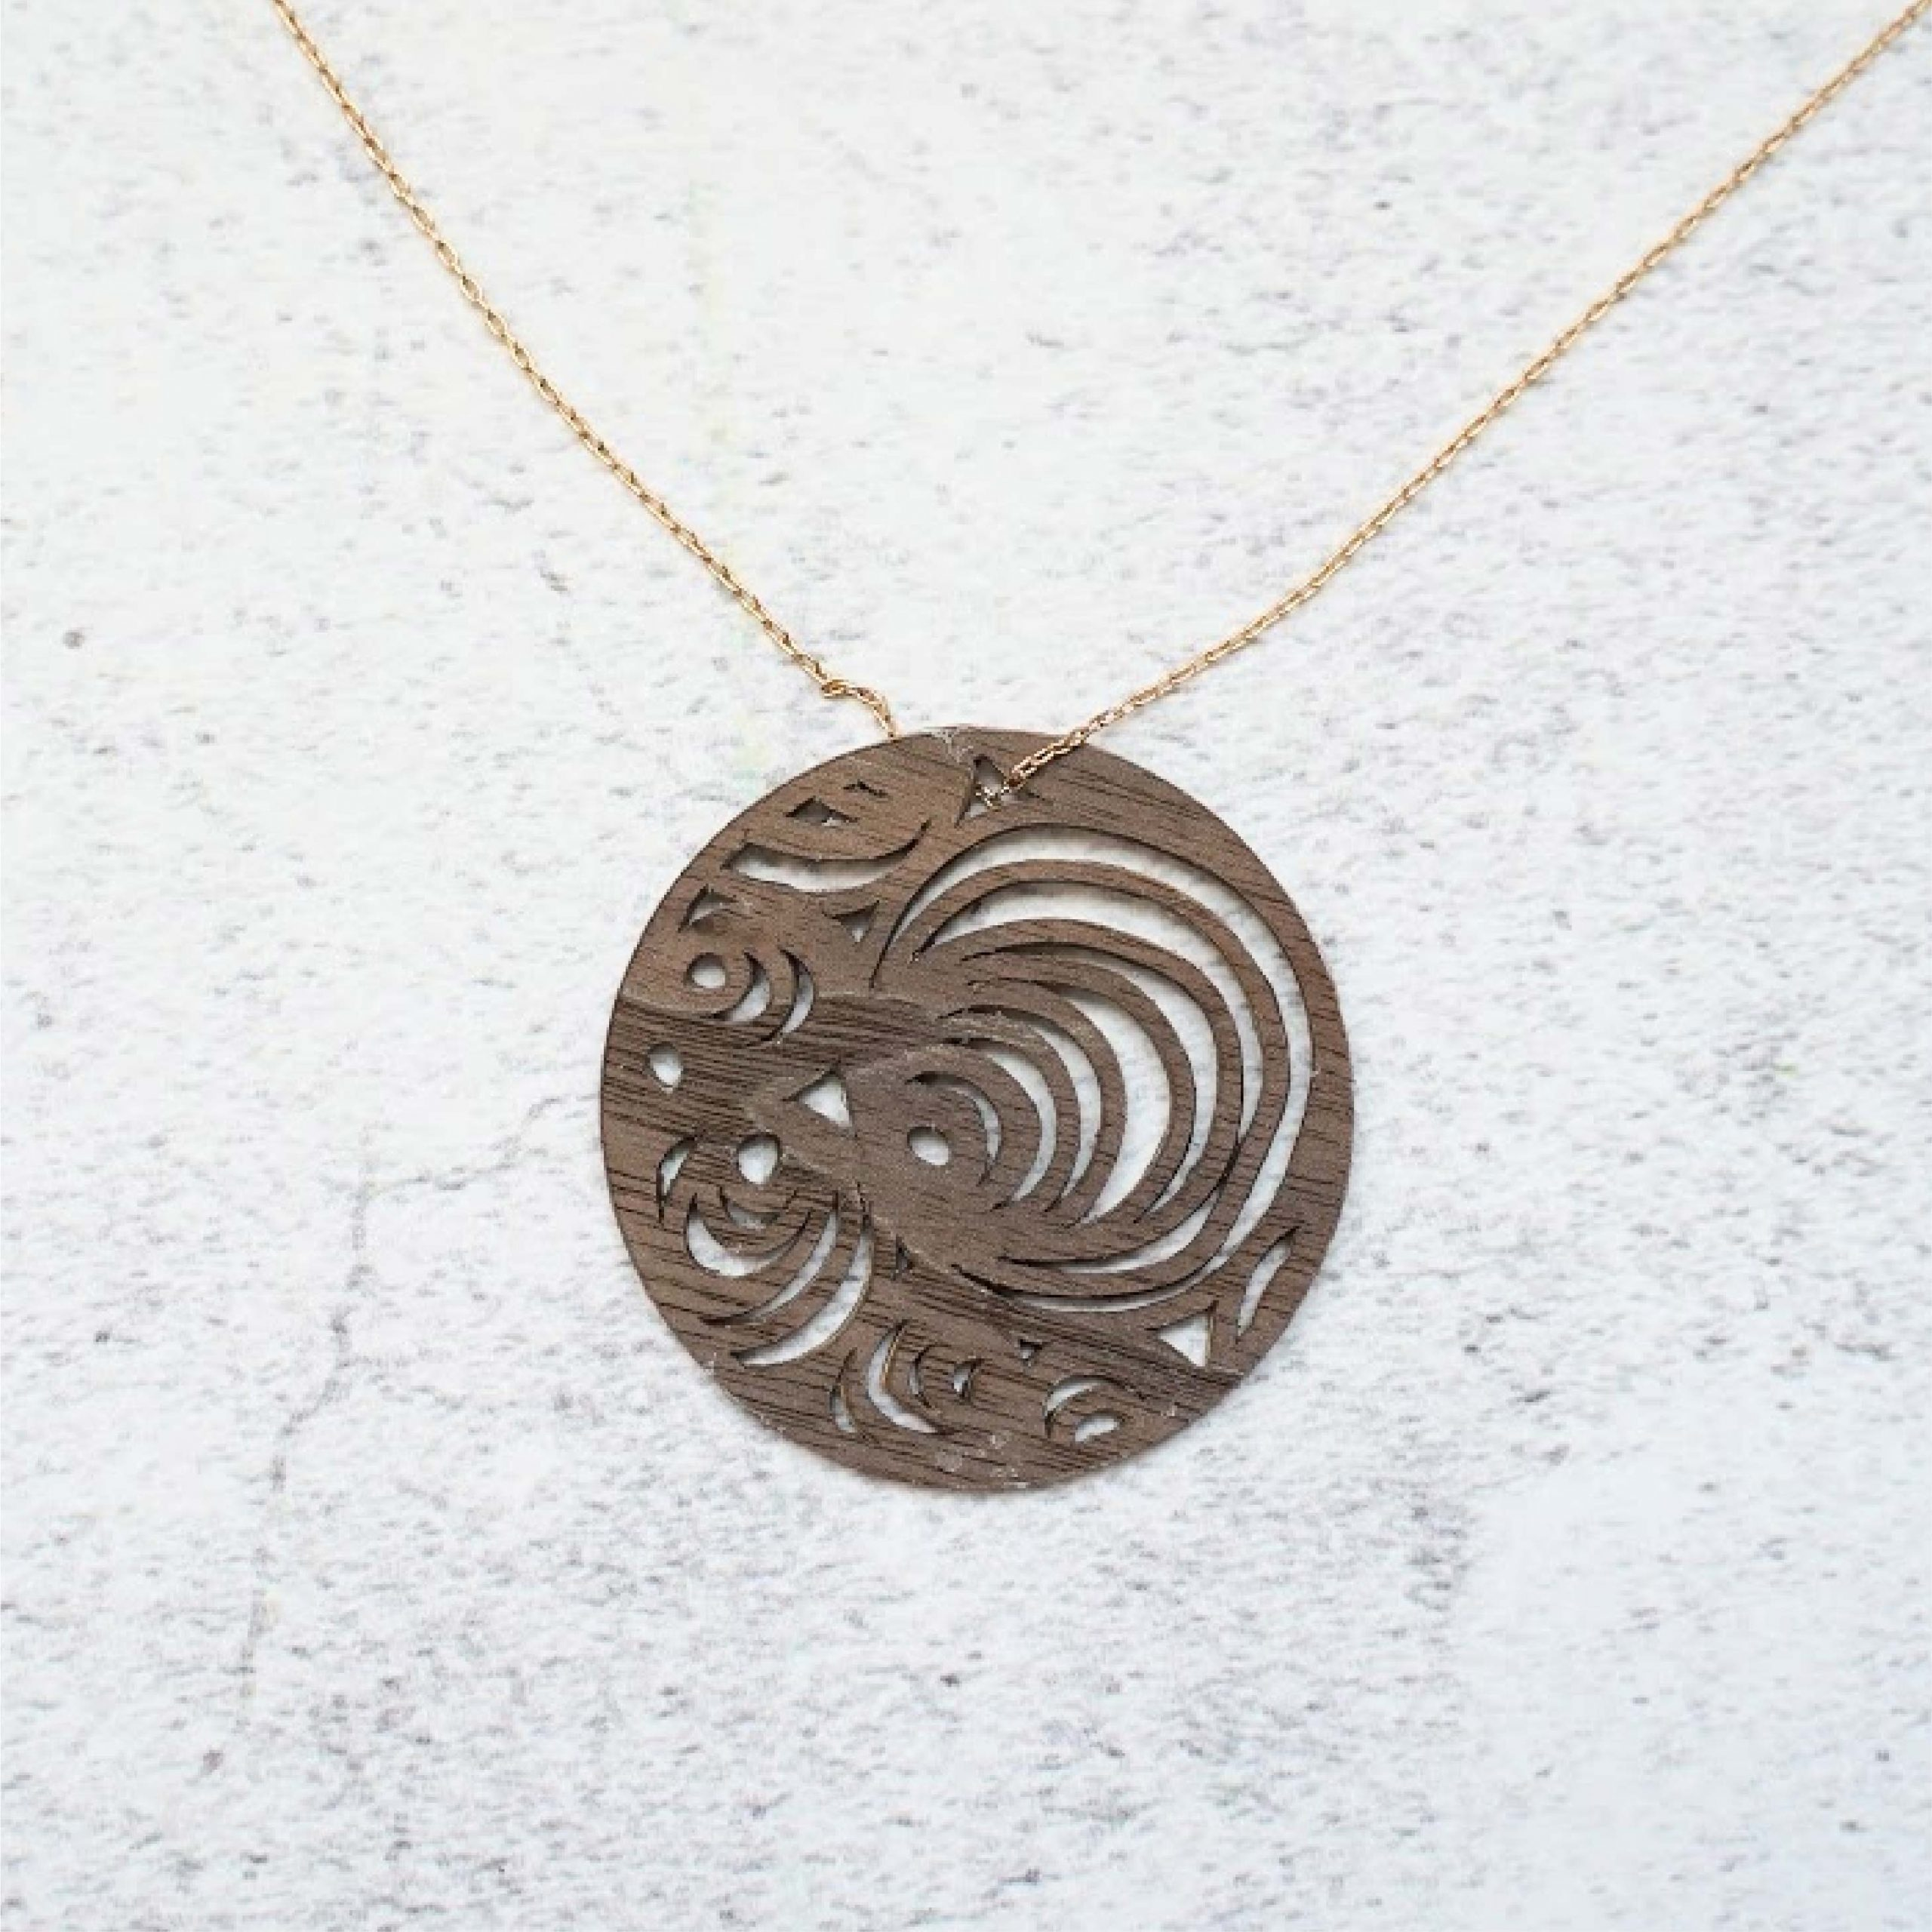 Geometric oval necklace